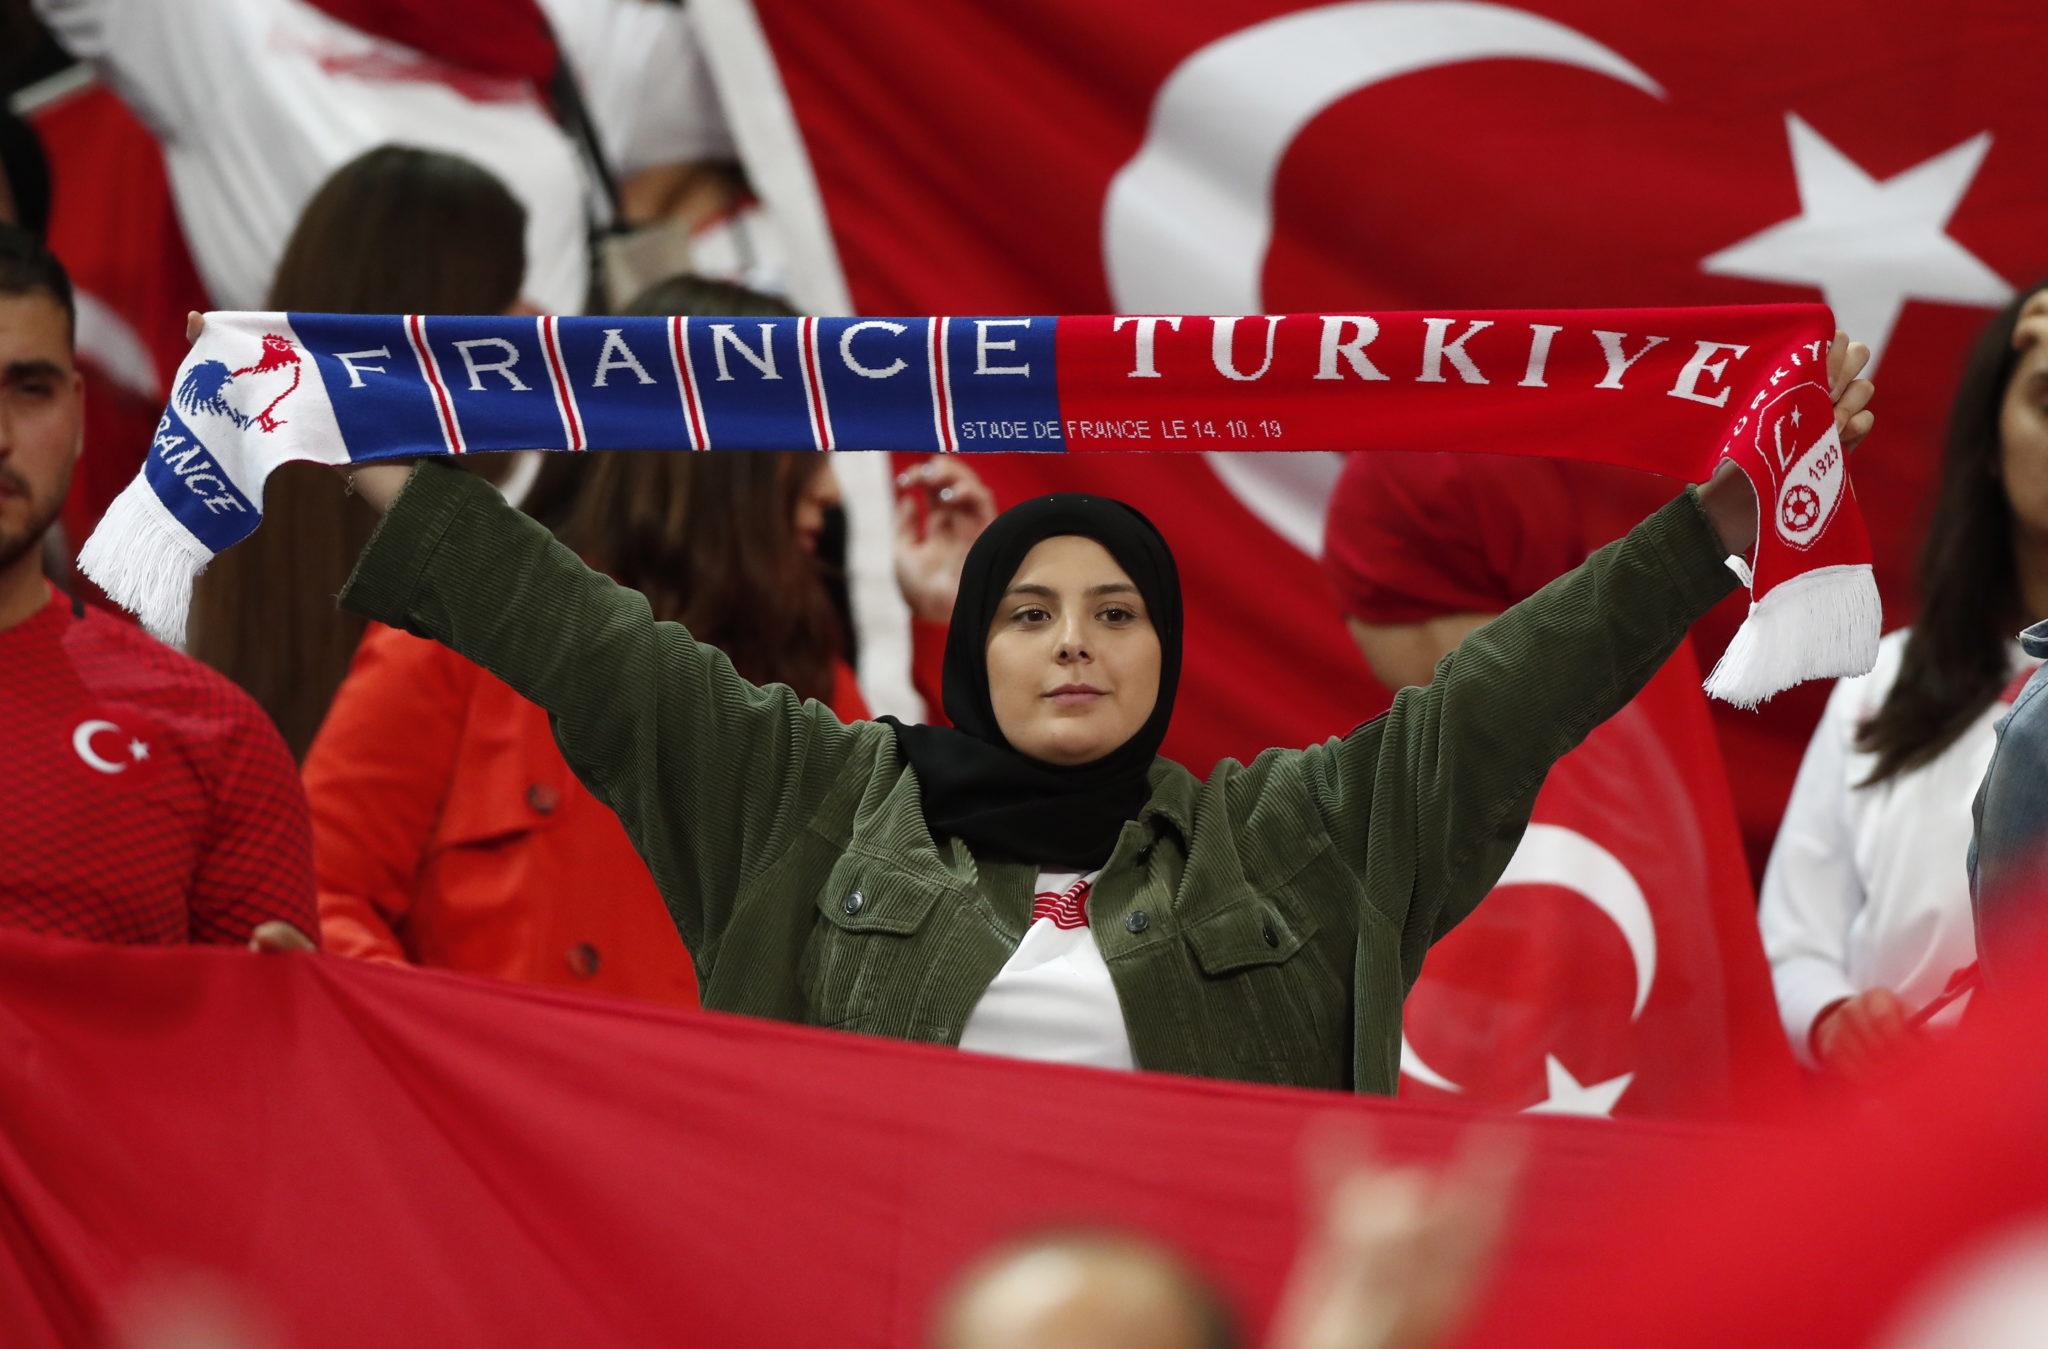 Eliminacje Euro 2020, mecz Francja - Turcja, fot. Ian Langsdon, PAP/EPA